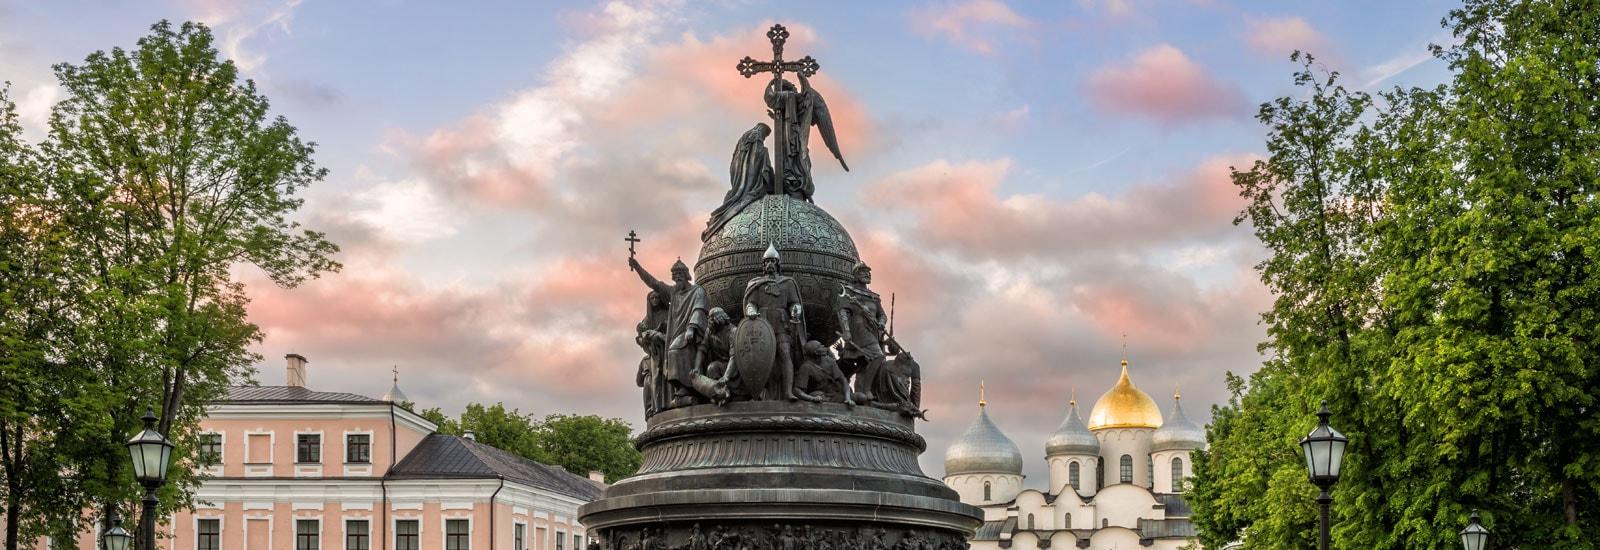 Novgorod the Great, Russia Millenium Monument and Philharmonics